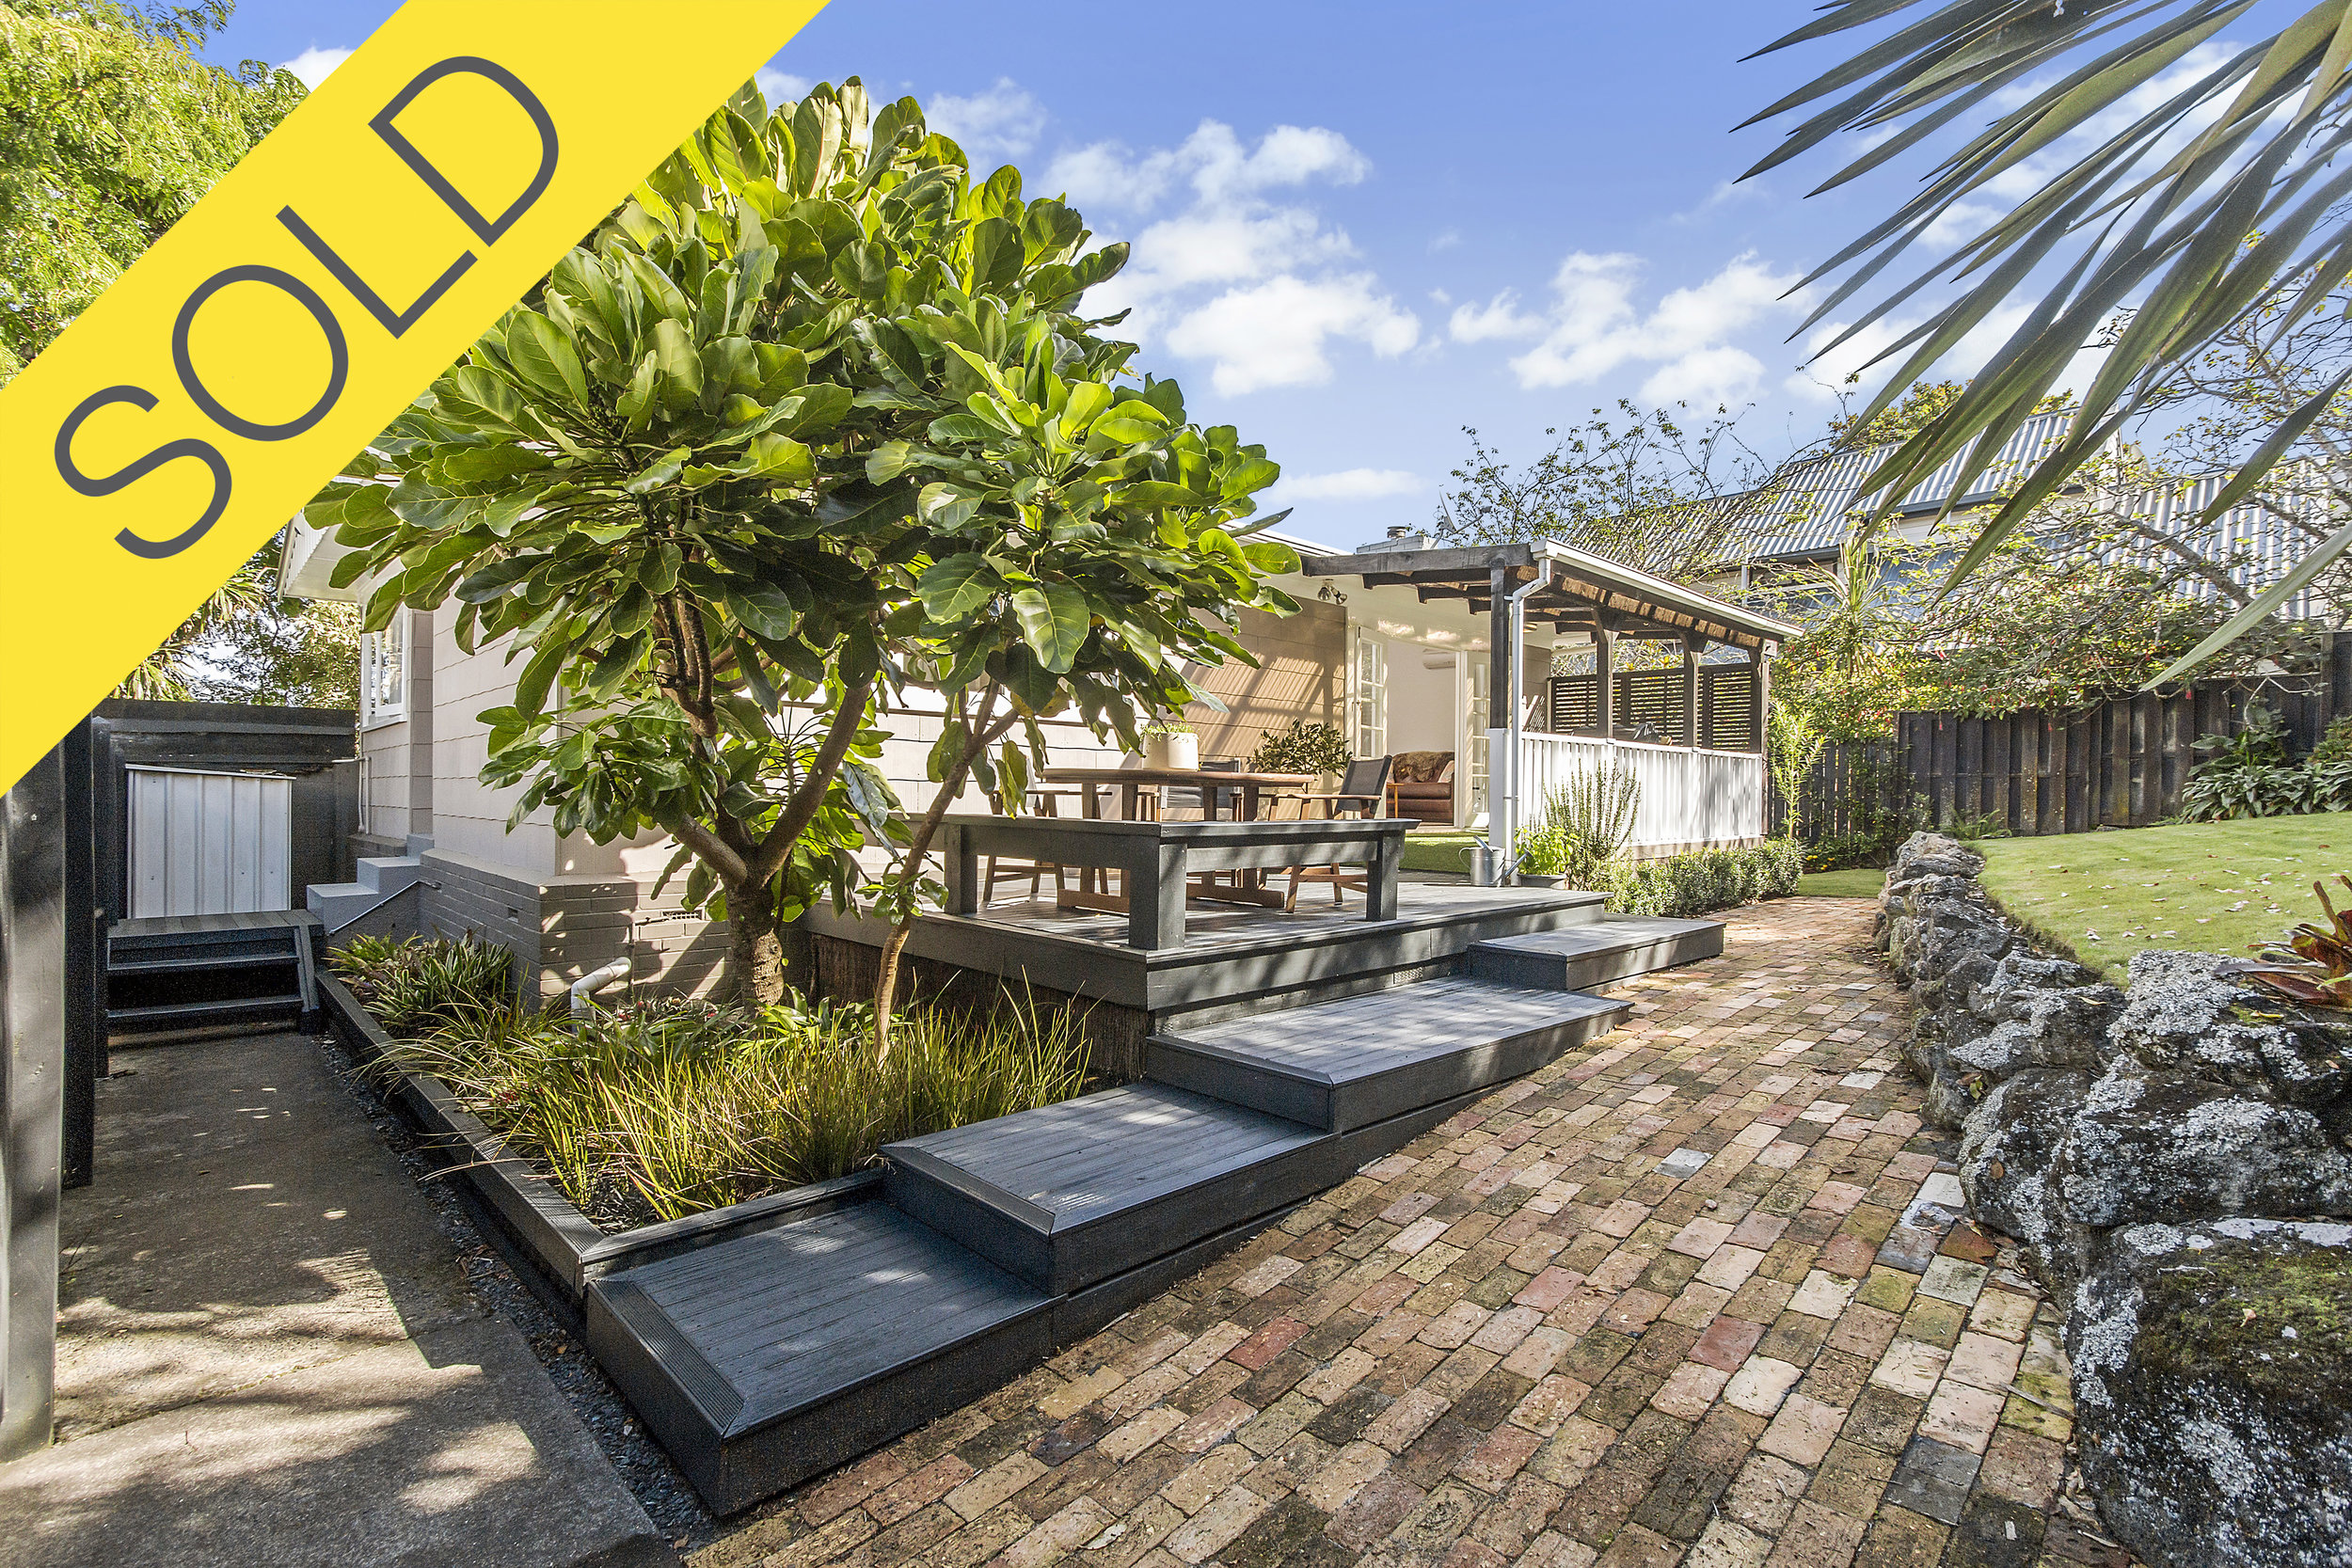 28A Moana Avenue, Onehunga, Auckland - SOLD APRIL 20182 Beds | 1 Bath | 2 Parking